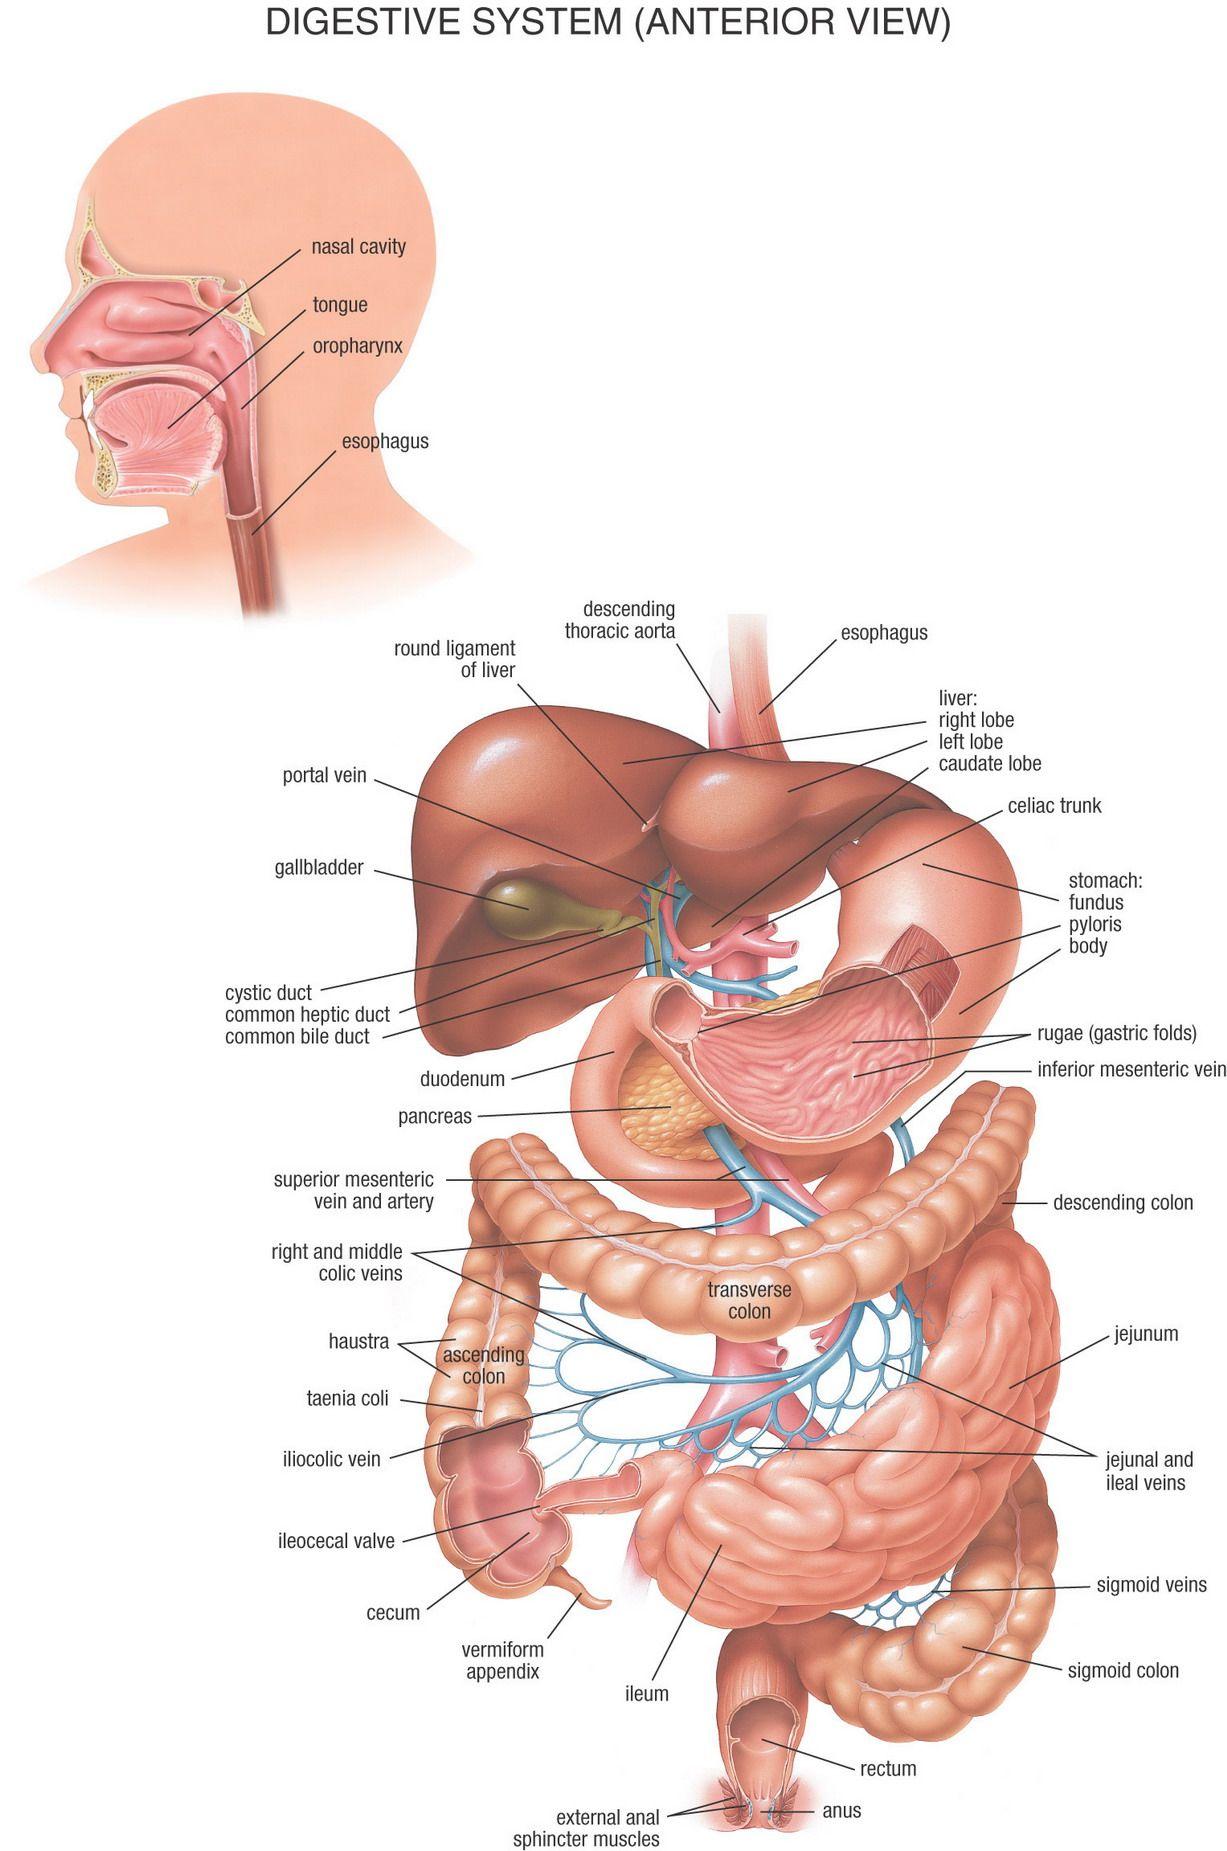 www.mille-soeren.dk 20_du_kan_redde_liv 20a_anatomy_pictures ...